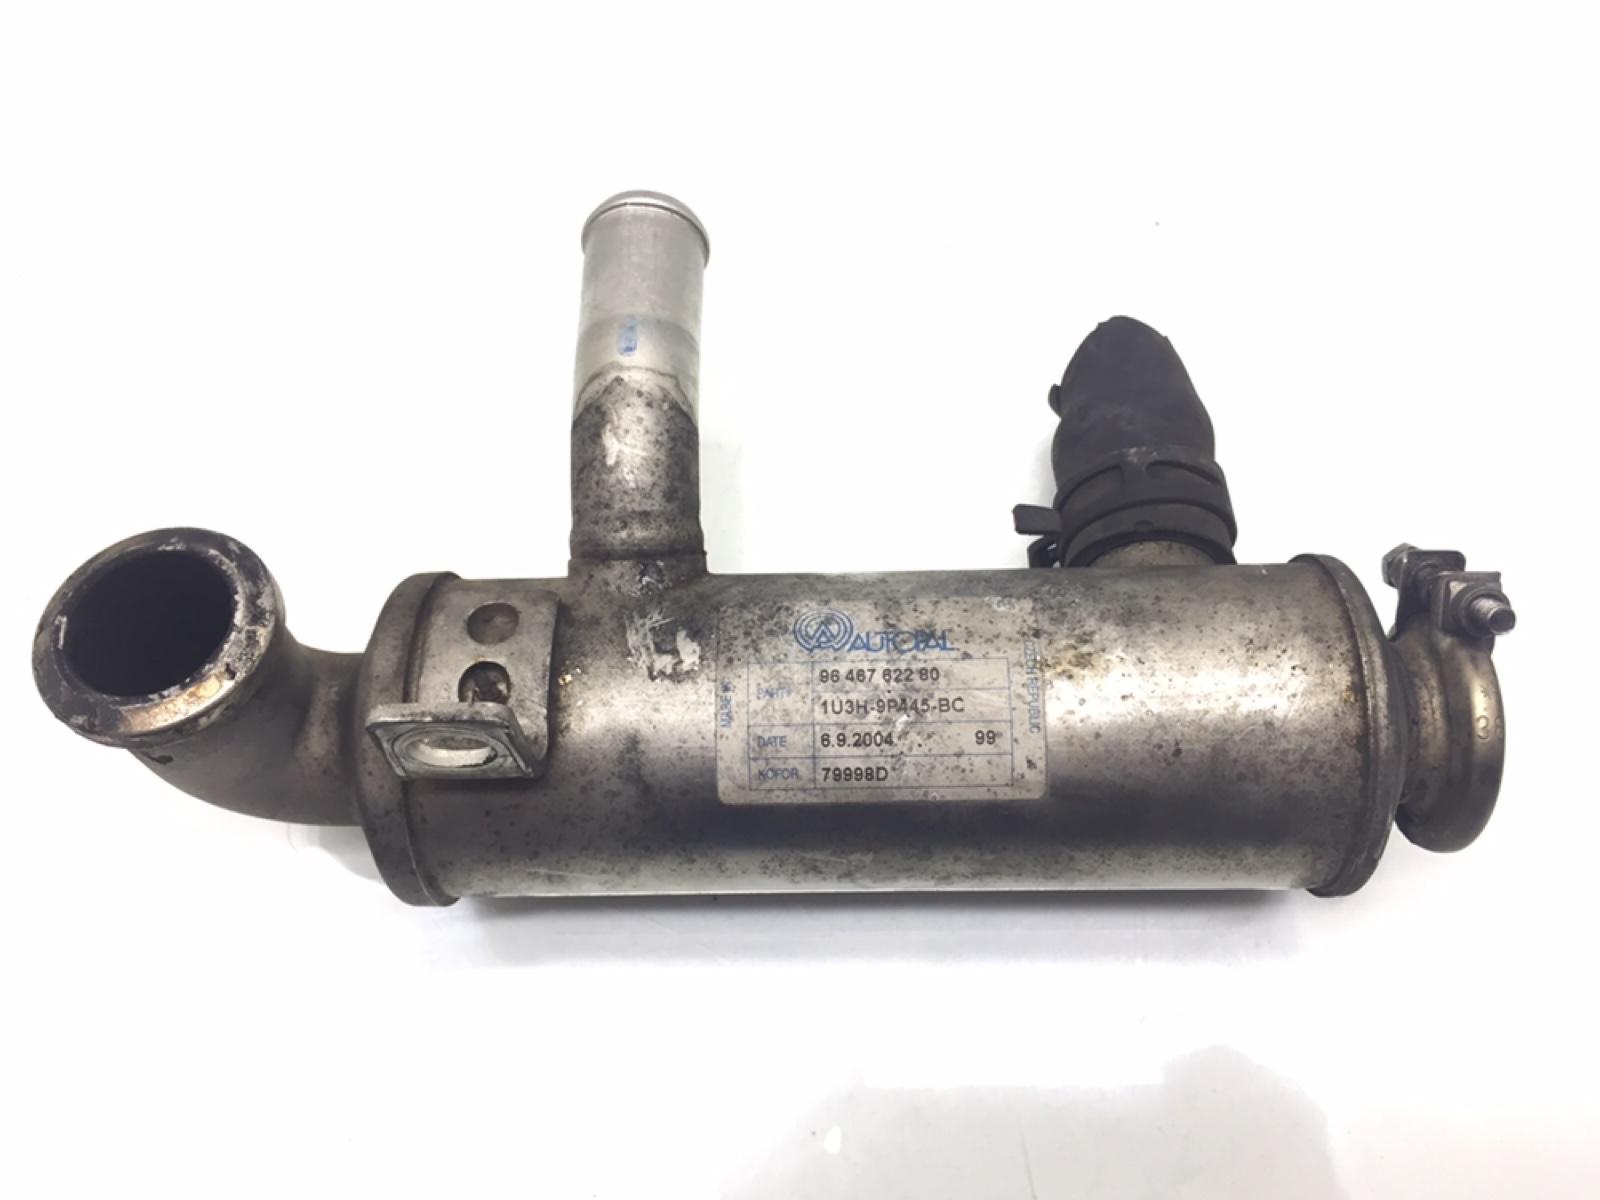 Радиатор egr Citroen C5 1.6 HDI 2004 (б/у)